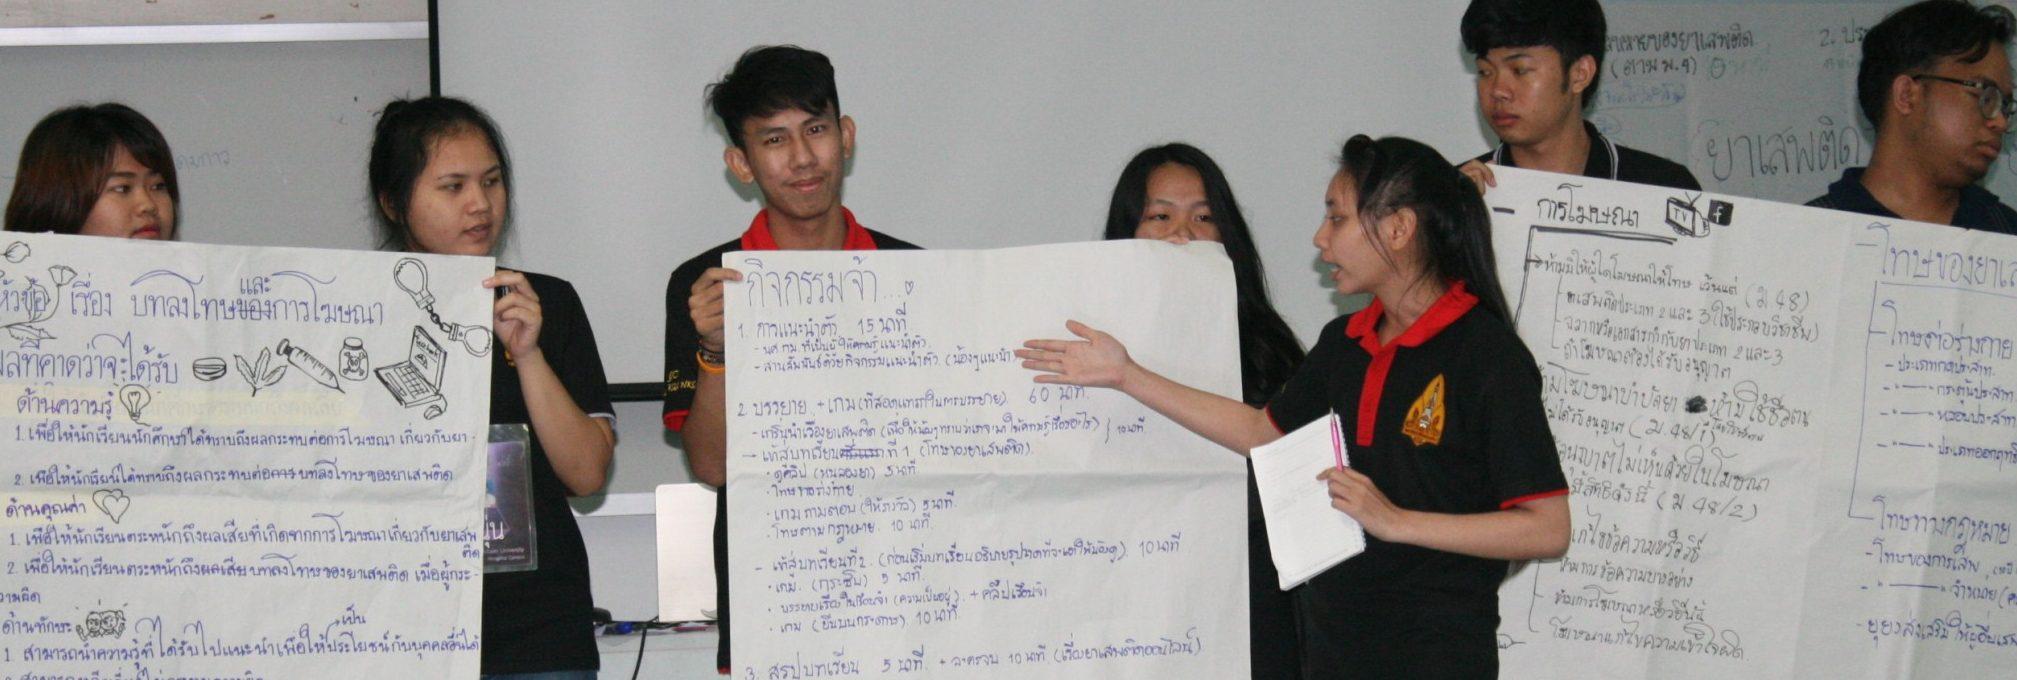 The Beginnings of a CLE Program at Khon Kaen University (KKU)